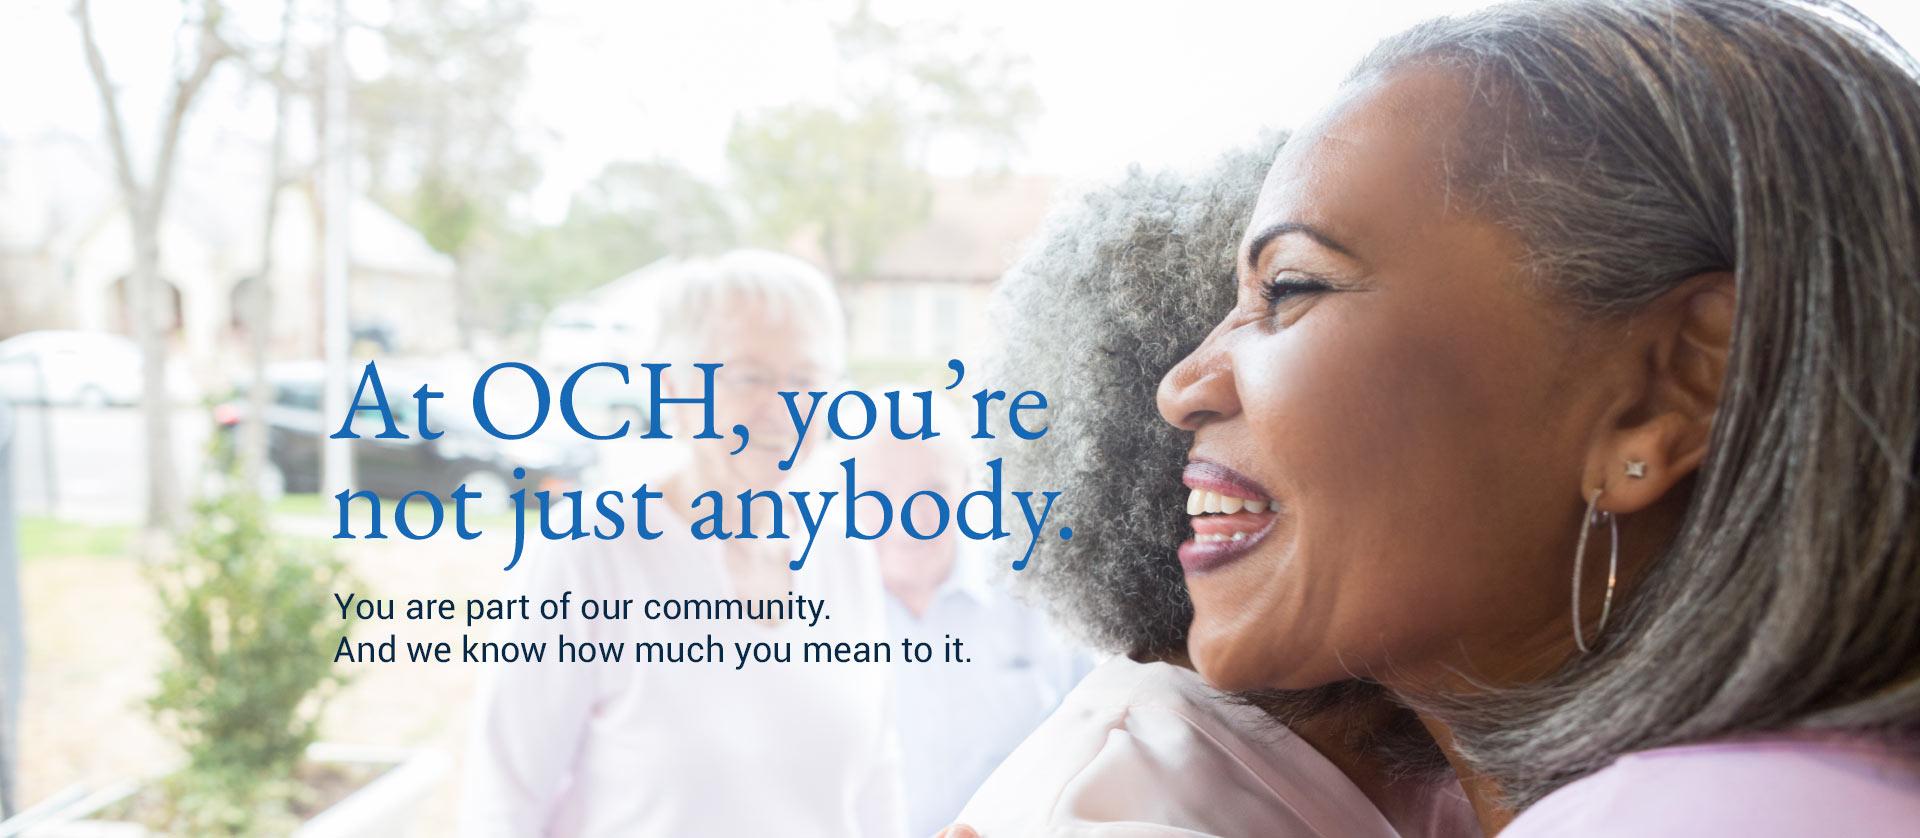 At OCH, you're not just anybody.